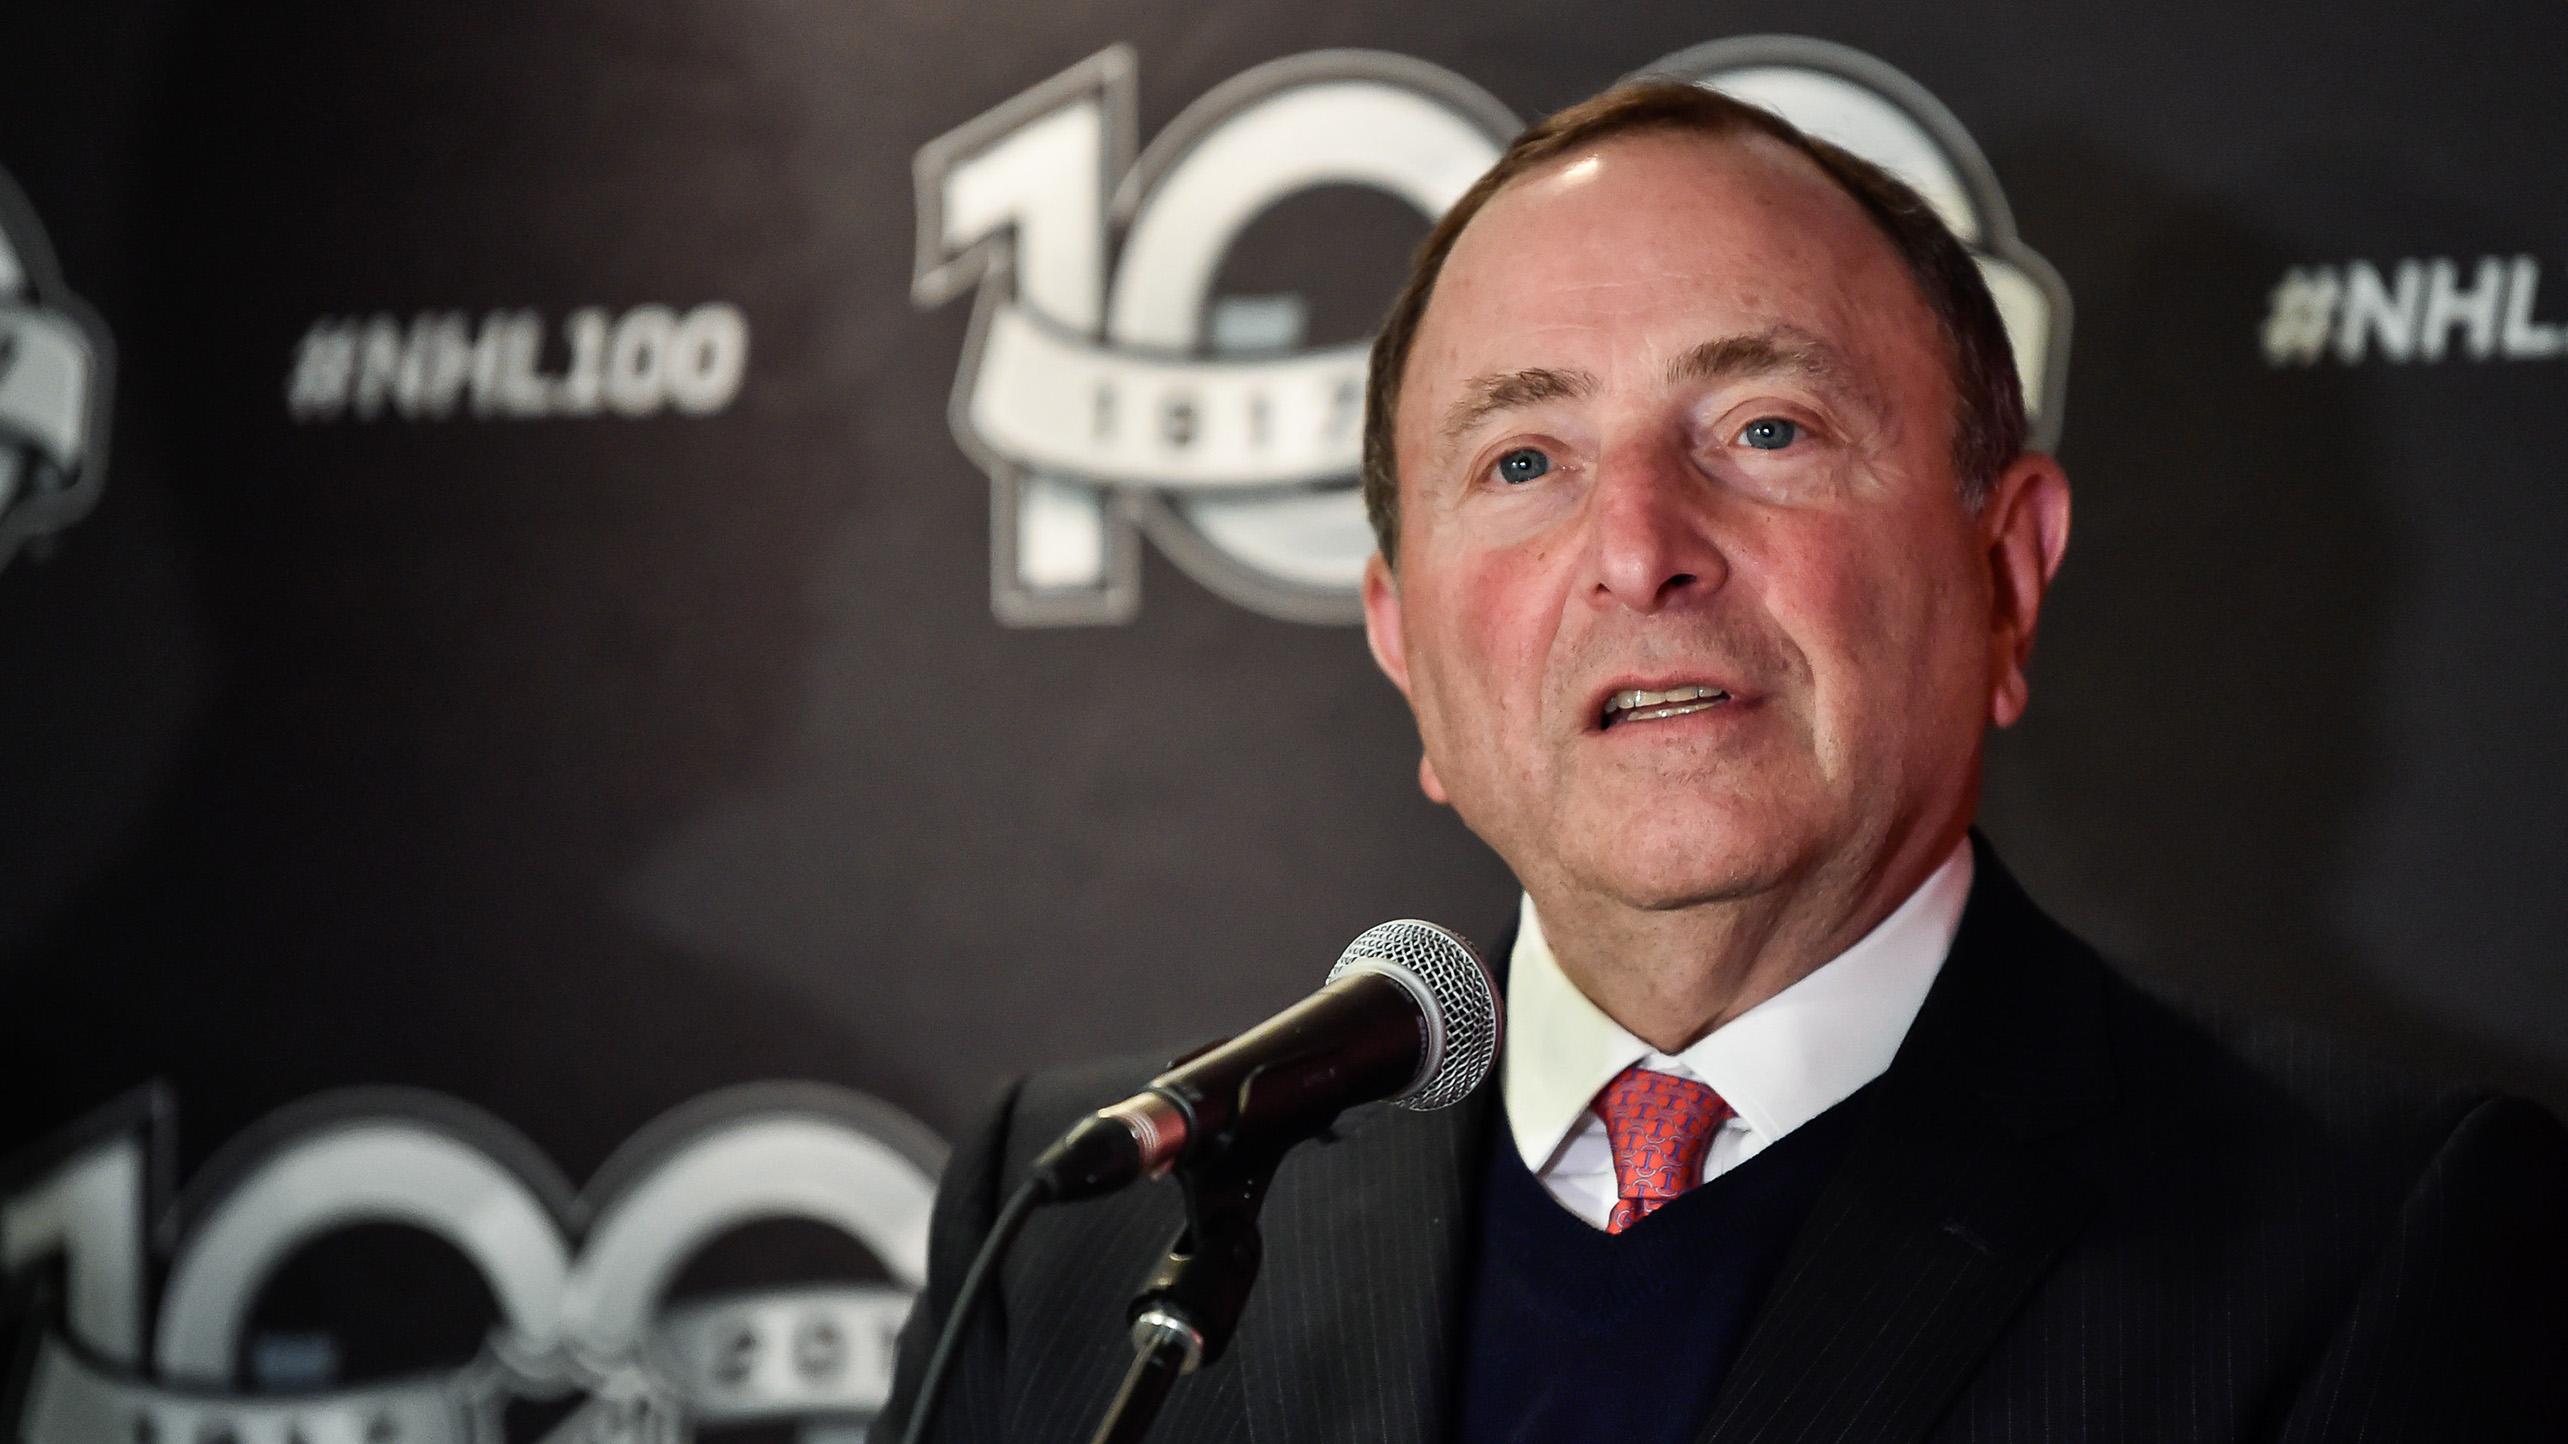 NHL Commissioner Bettman Reiterates Support for Isles' Belmont Bid